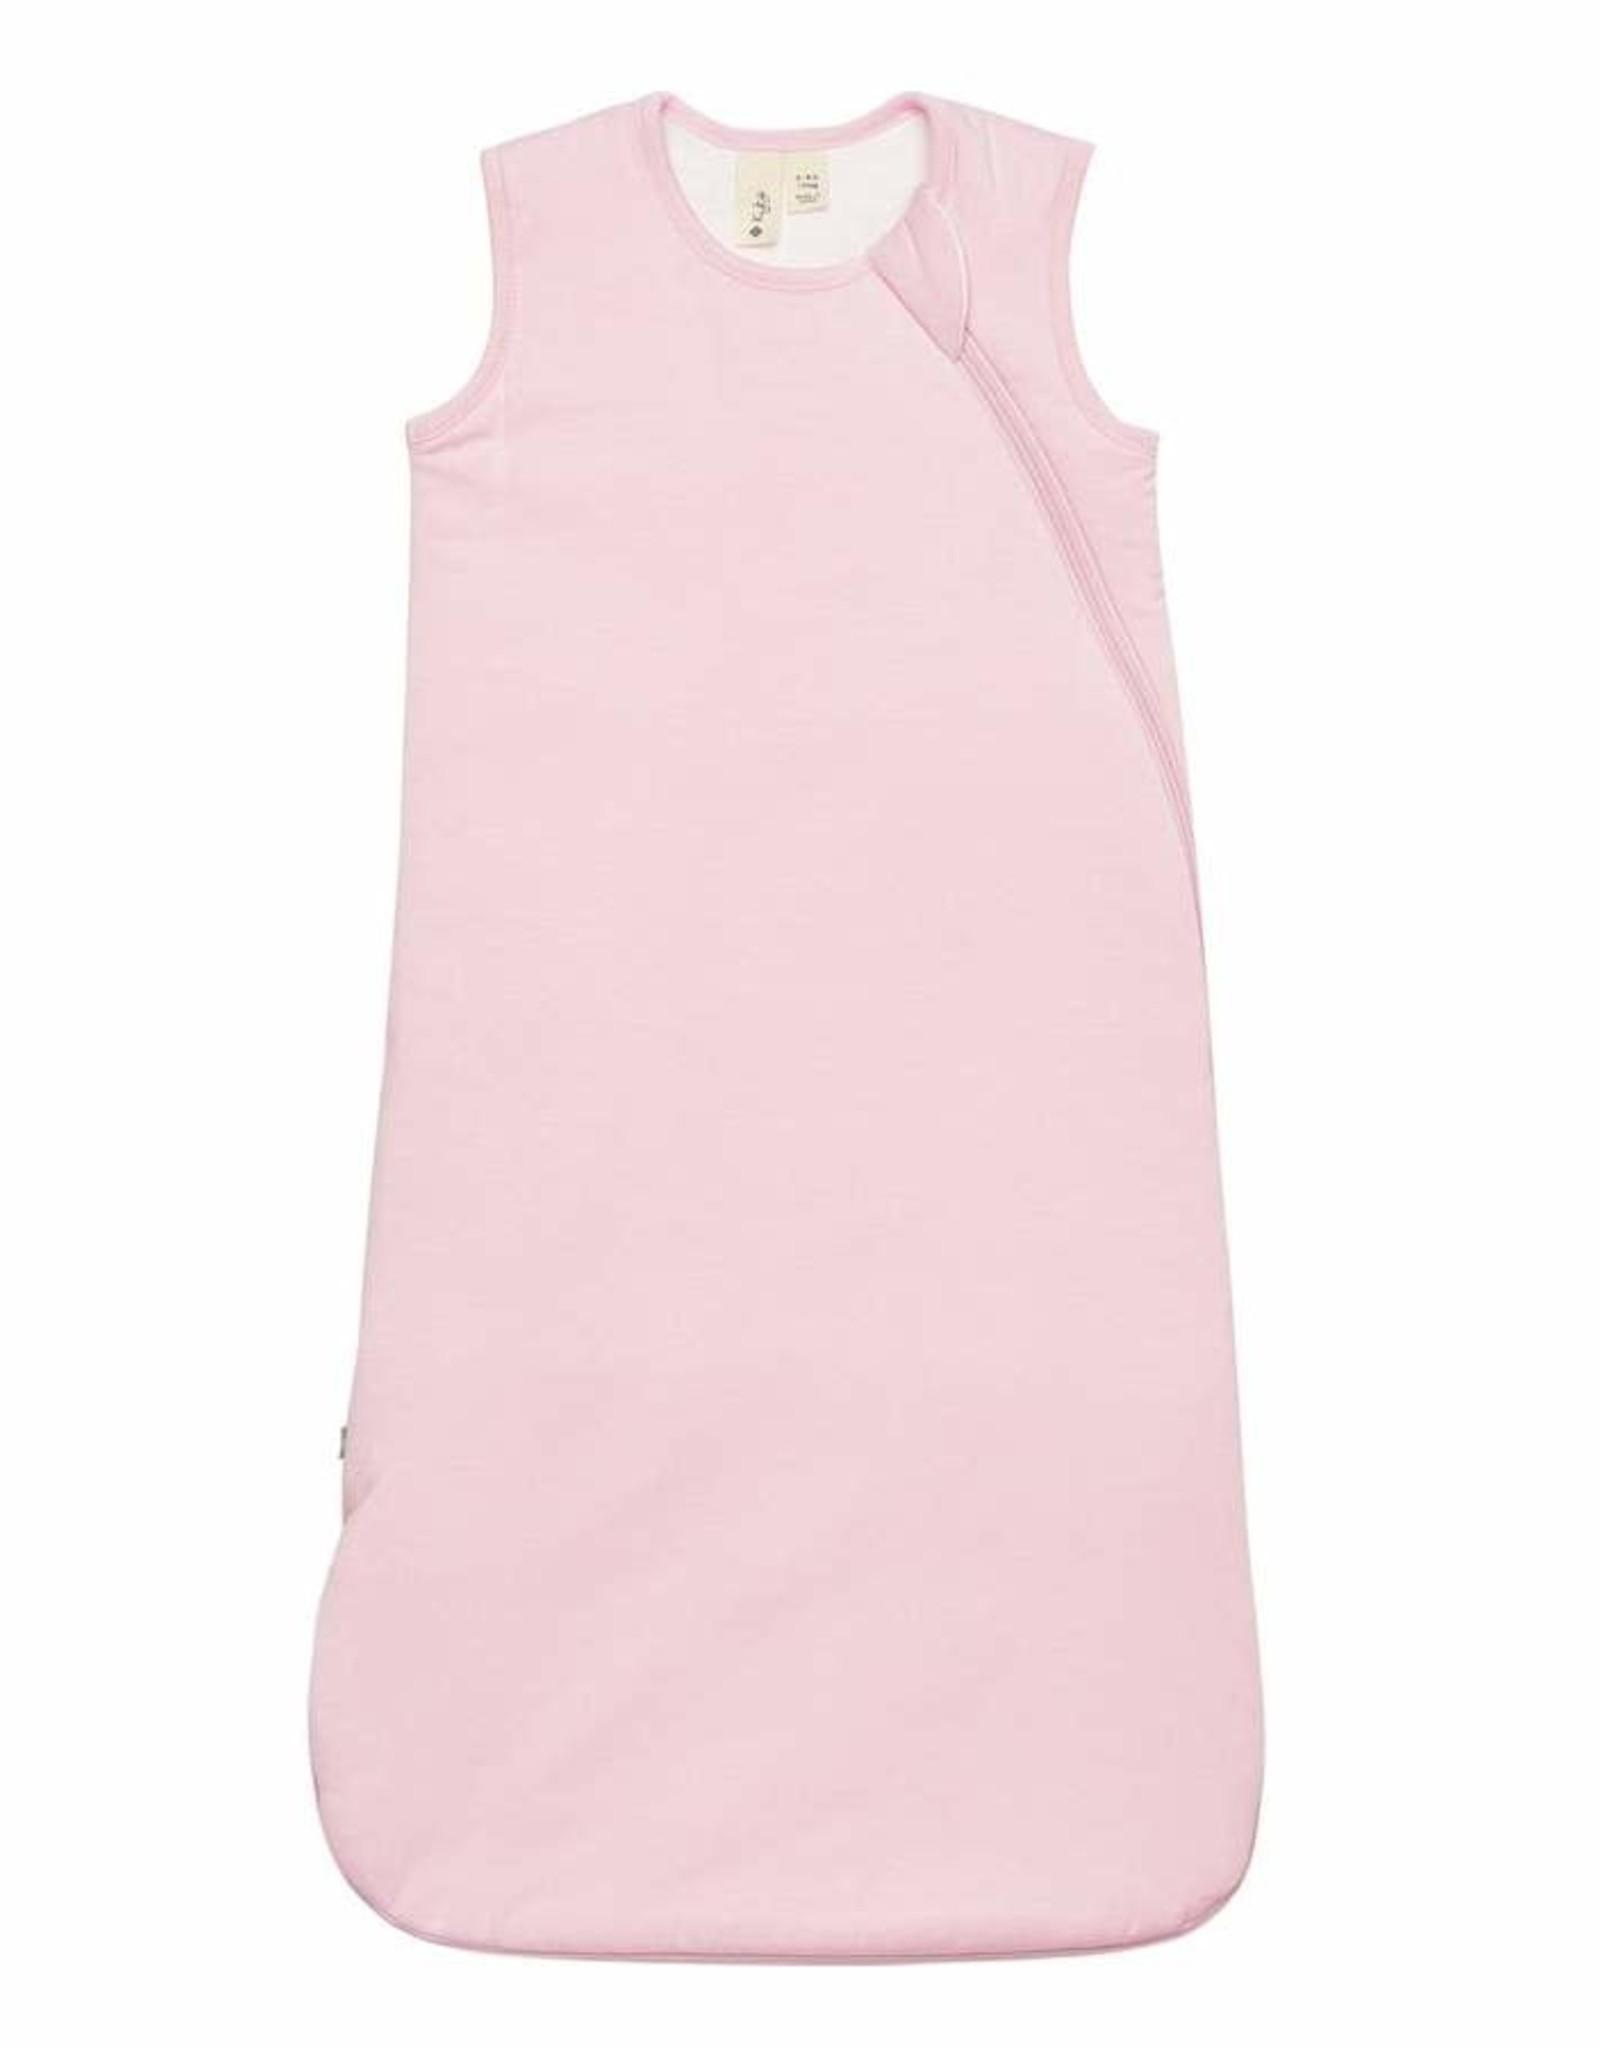 Kyte Baby sleep bag 1.0 (0-6m)- peony